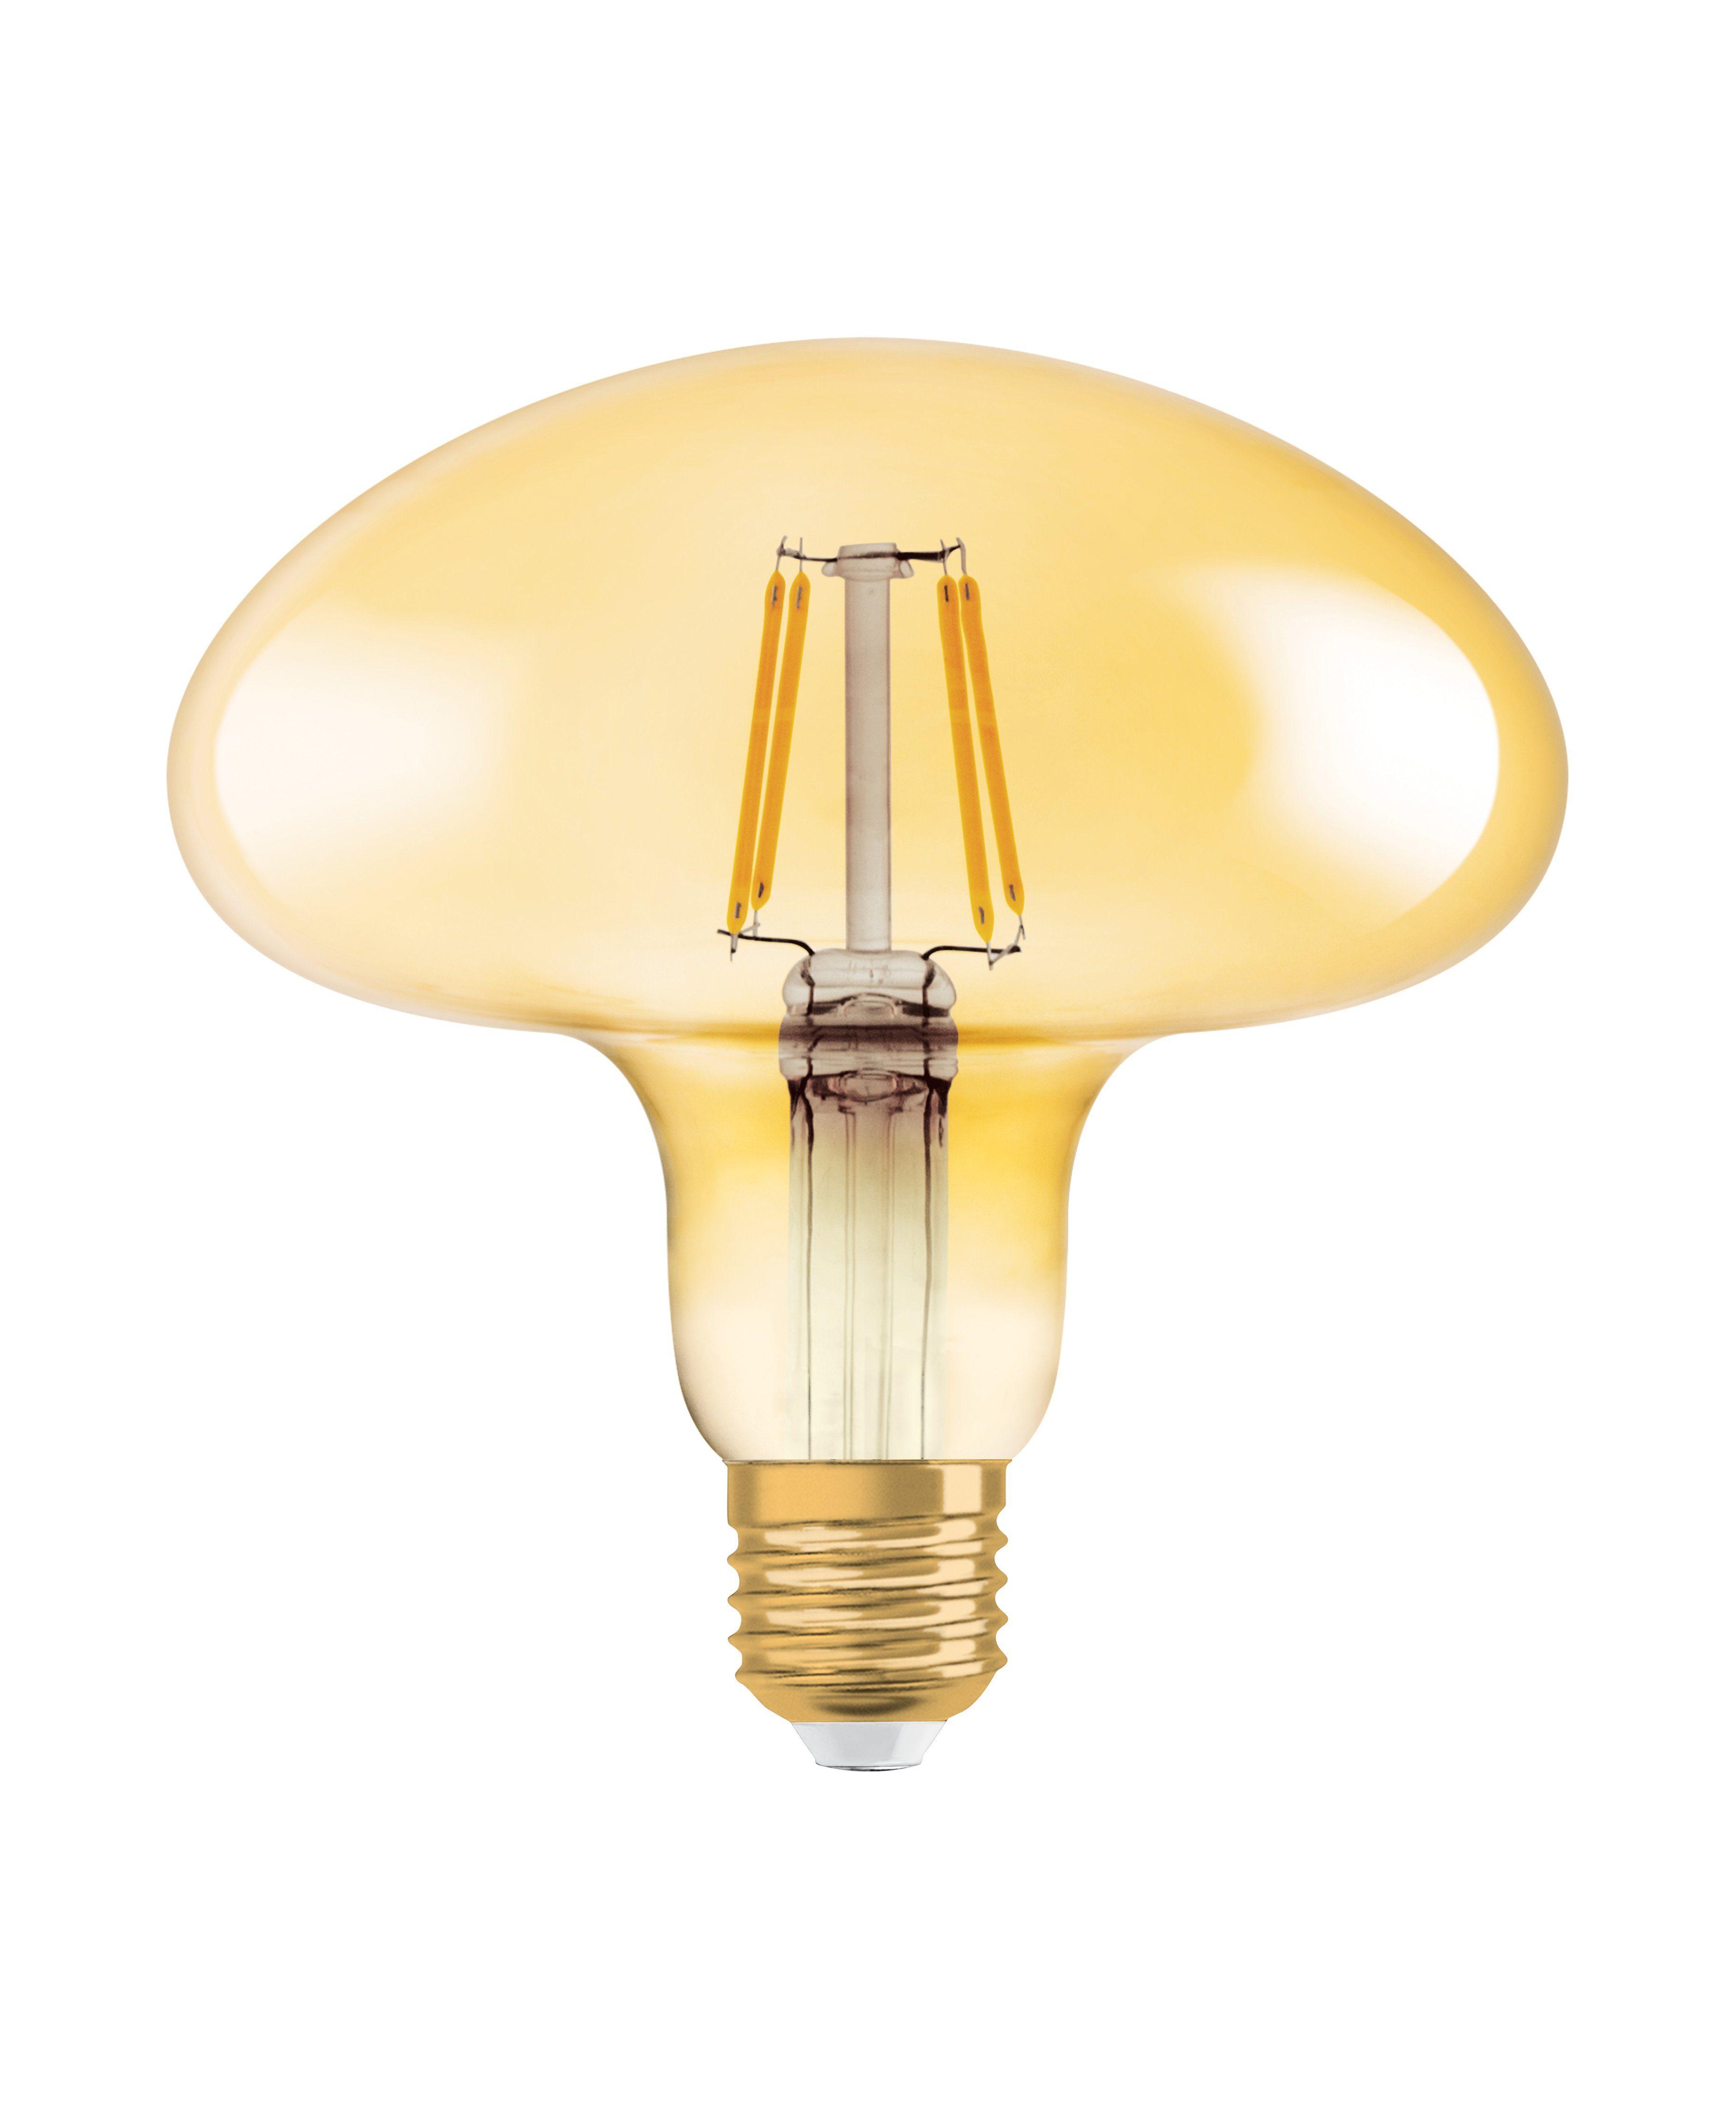 Osram LED-Lampe, Vintage-Edition »Vintage 1906 MUSHROOM 40 4.5 W/2500 E27 GOLD«